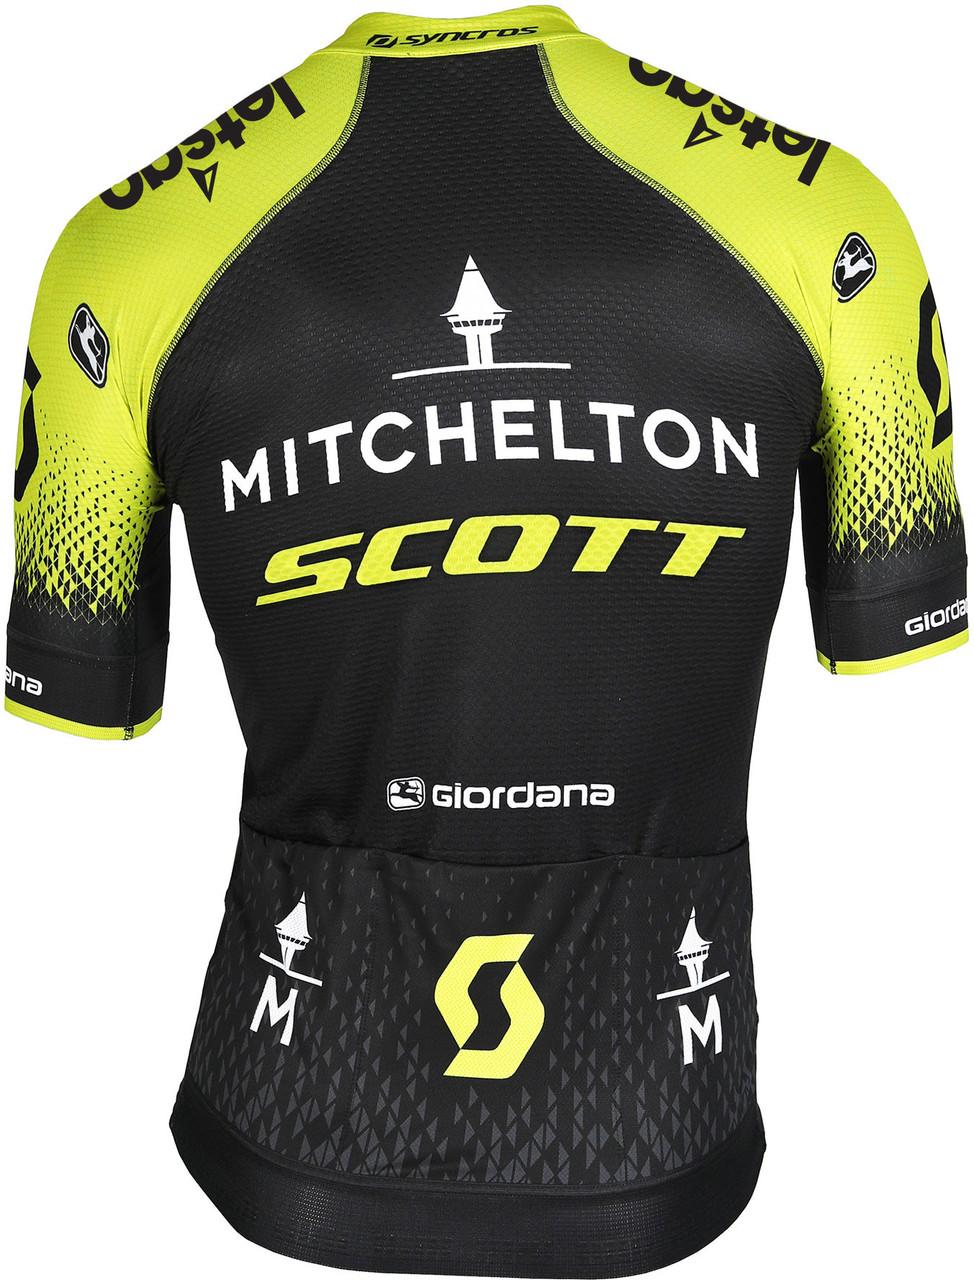 2020 Mitchelton Scott Vero Pro FZ Jersey Rear